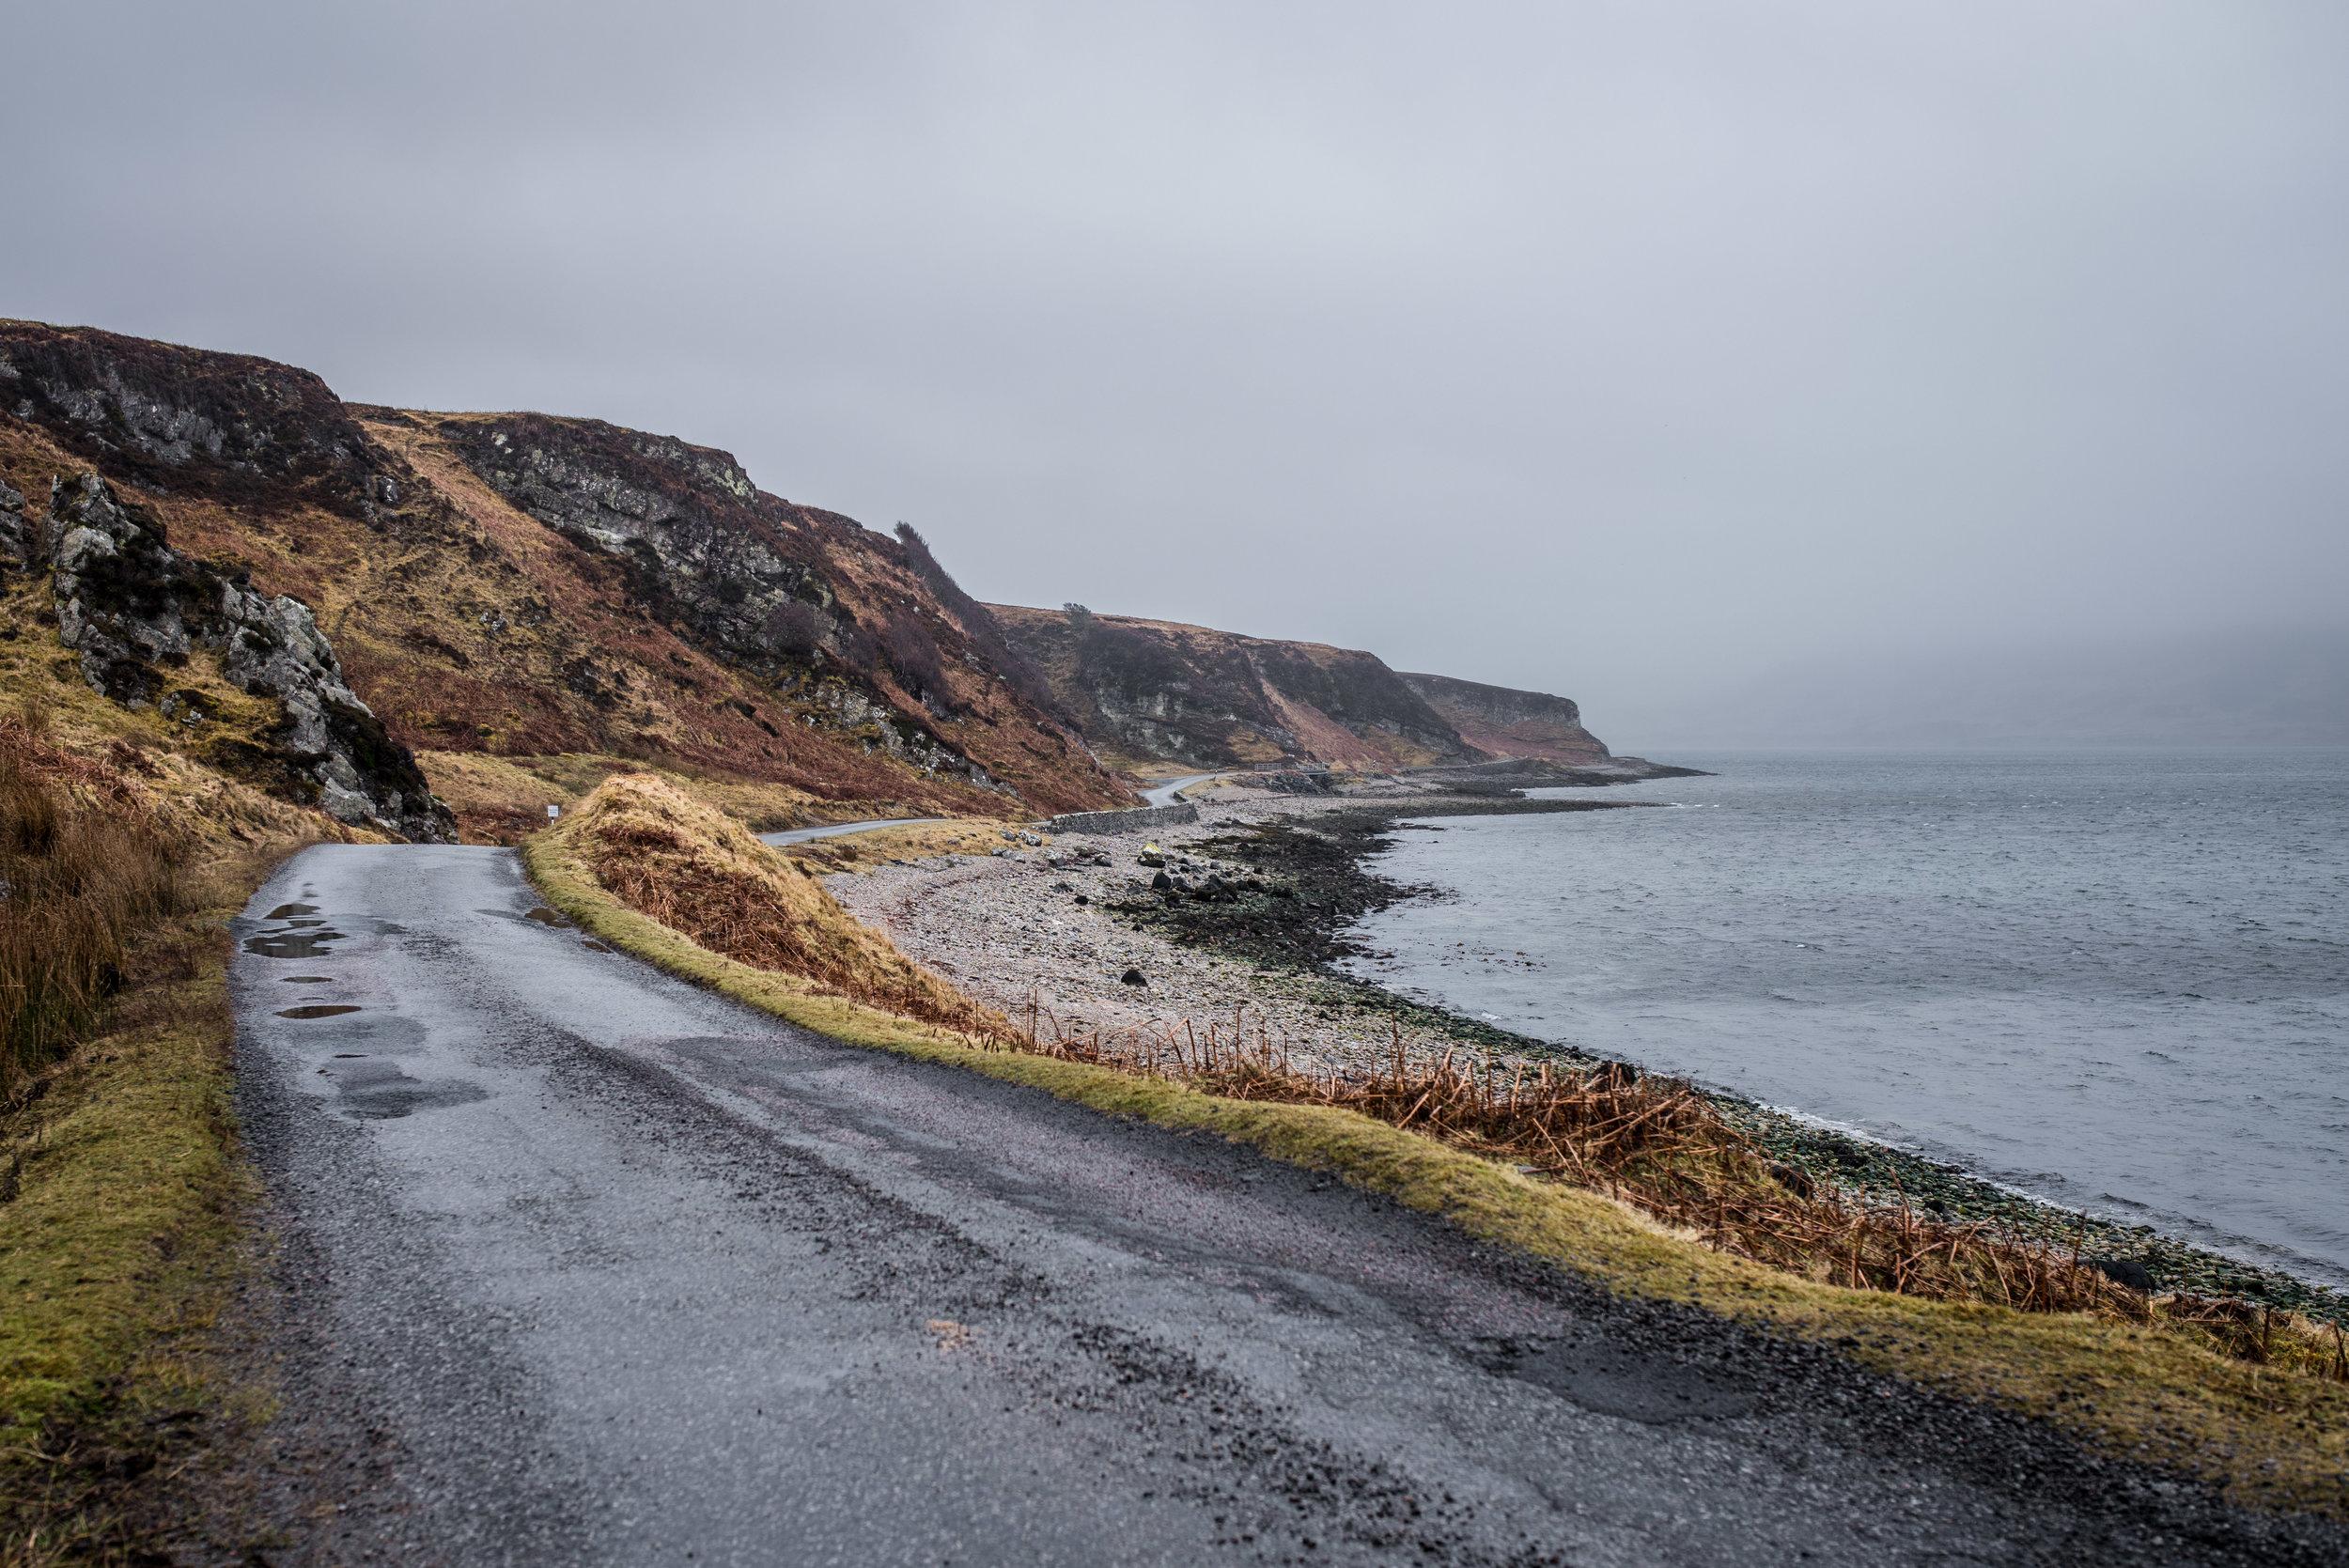 1. Drangarnir & Tindhólmur, crumbling into the sea